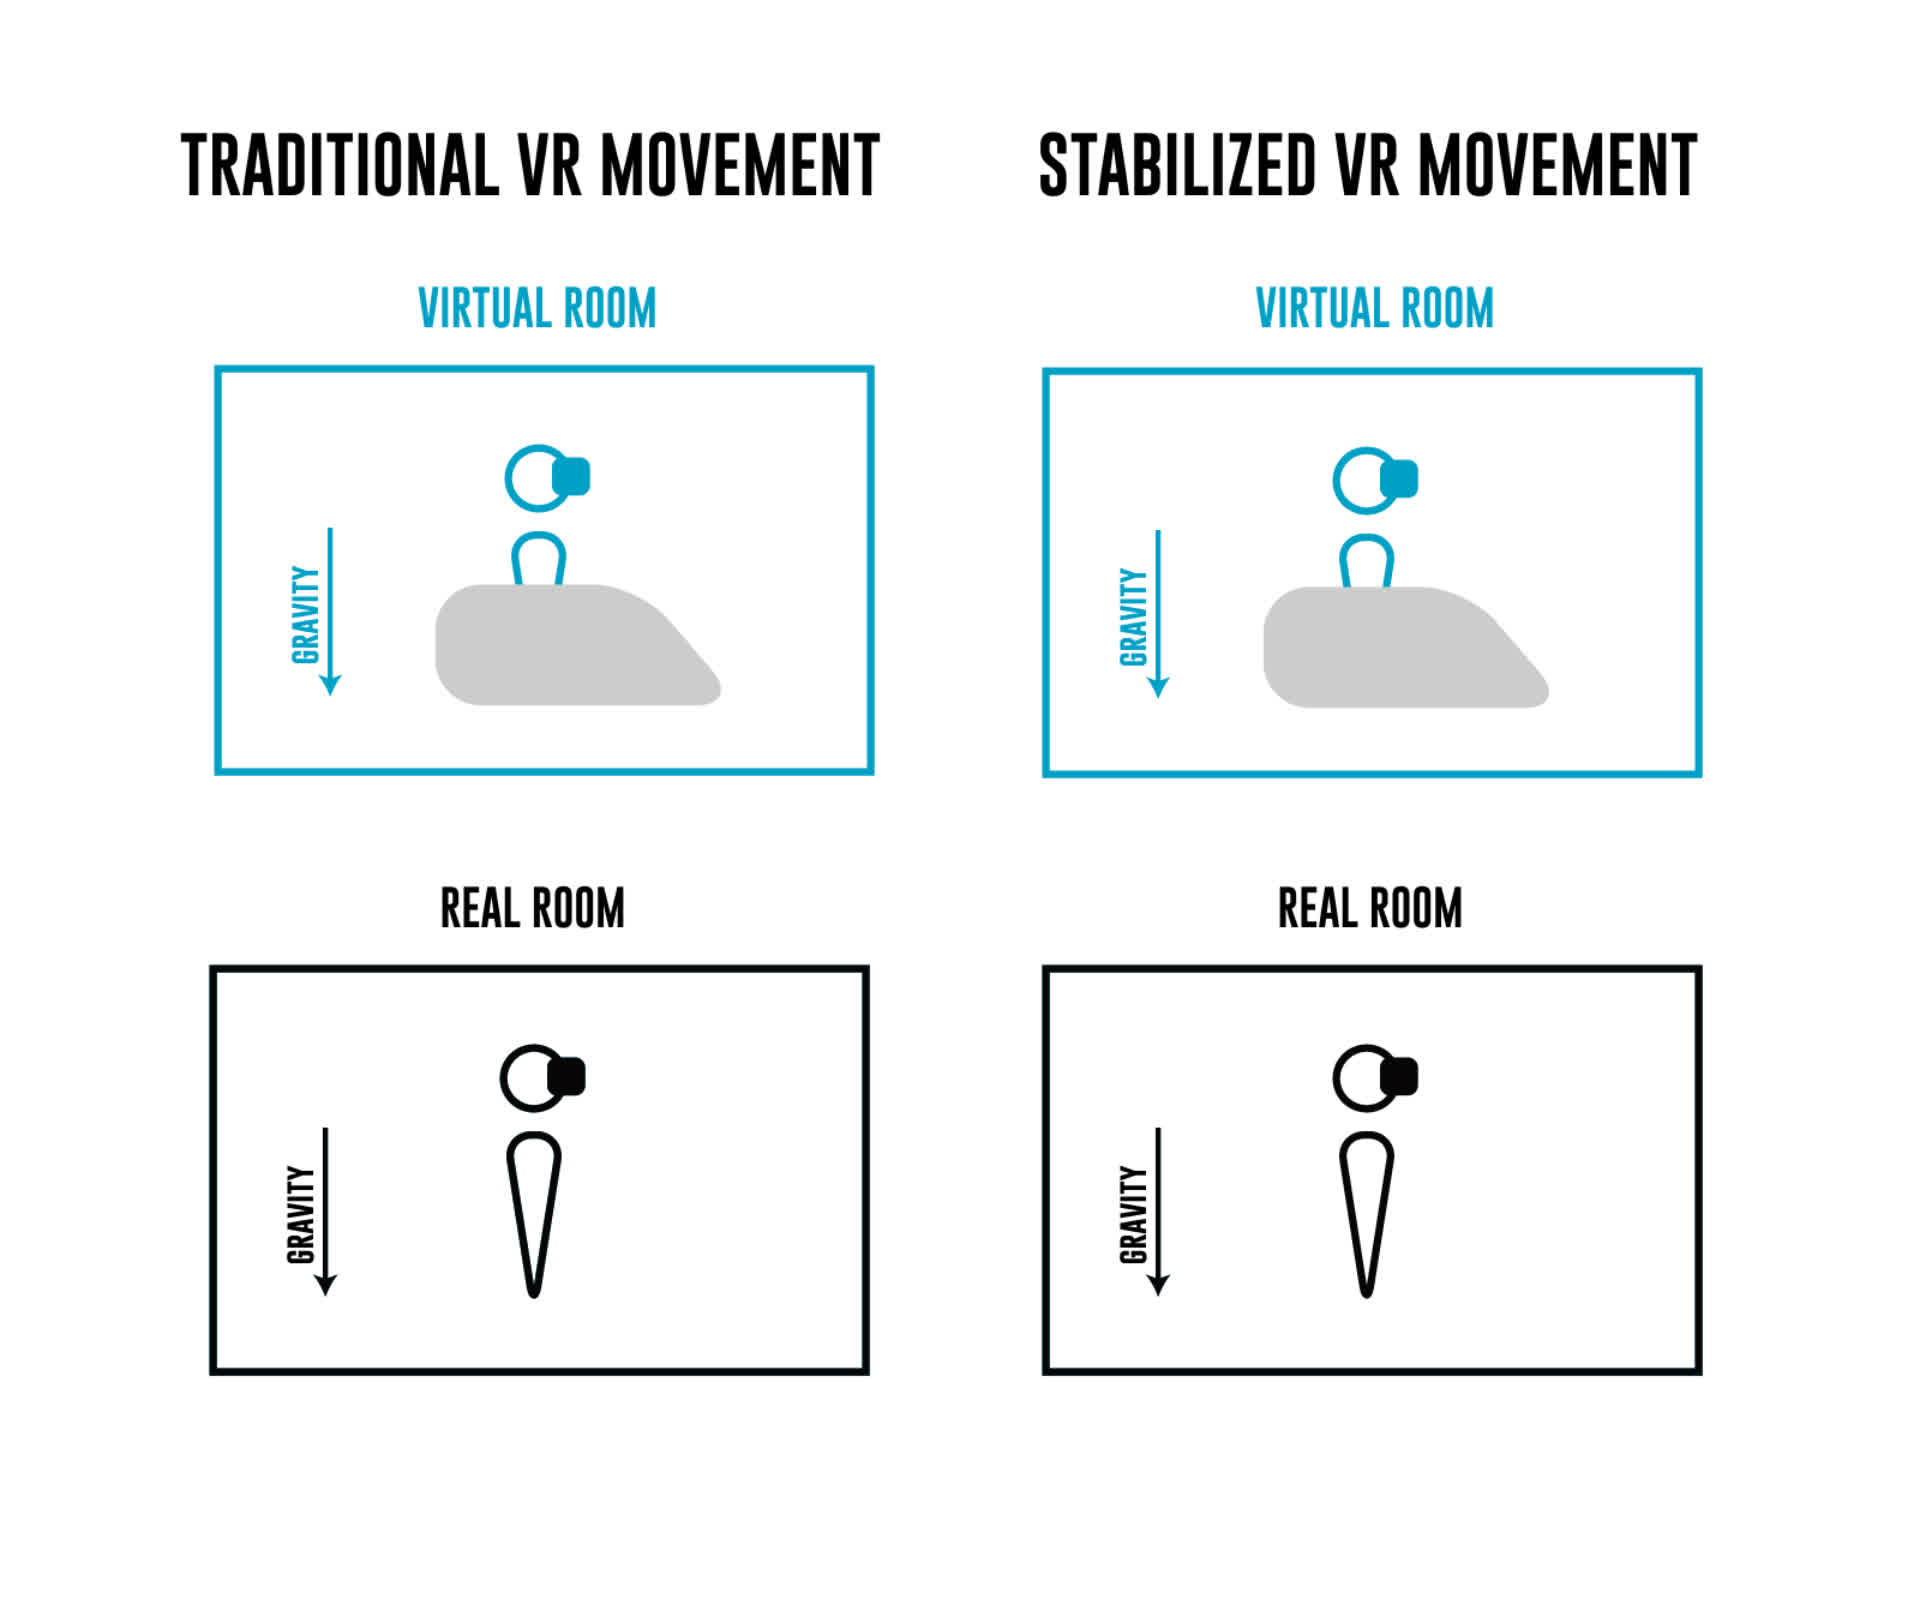 locomotion, simulatorsickness, virtualreality, Stabilized VR Movement GIFs